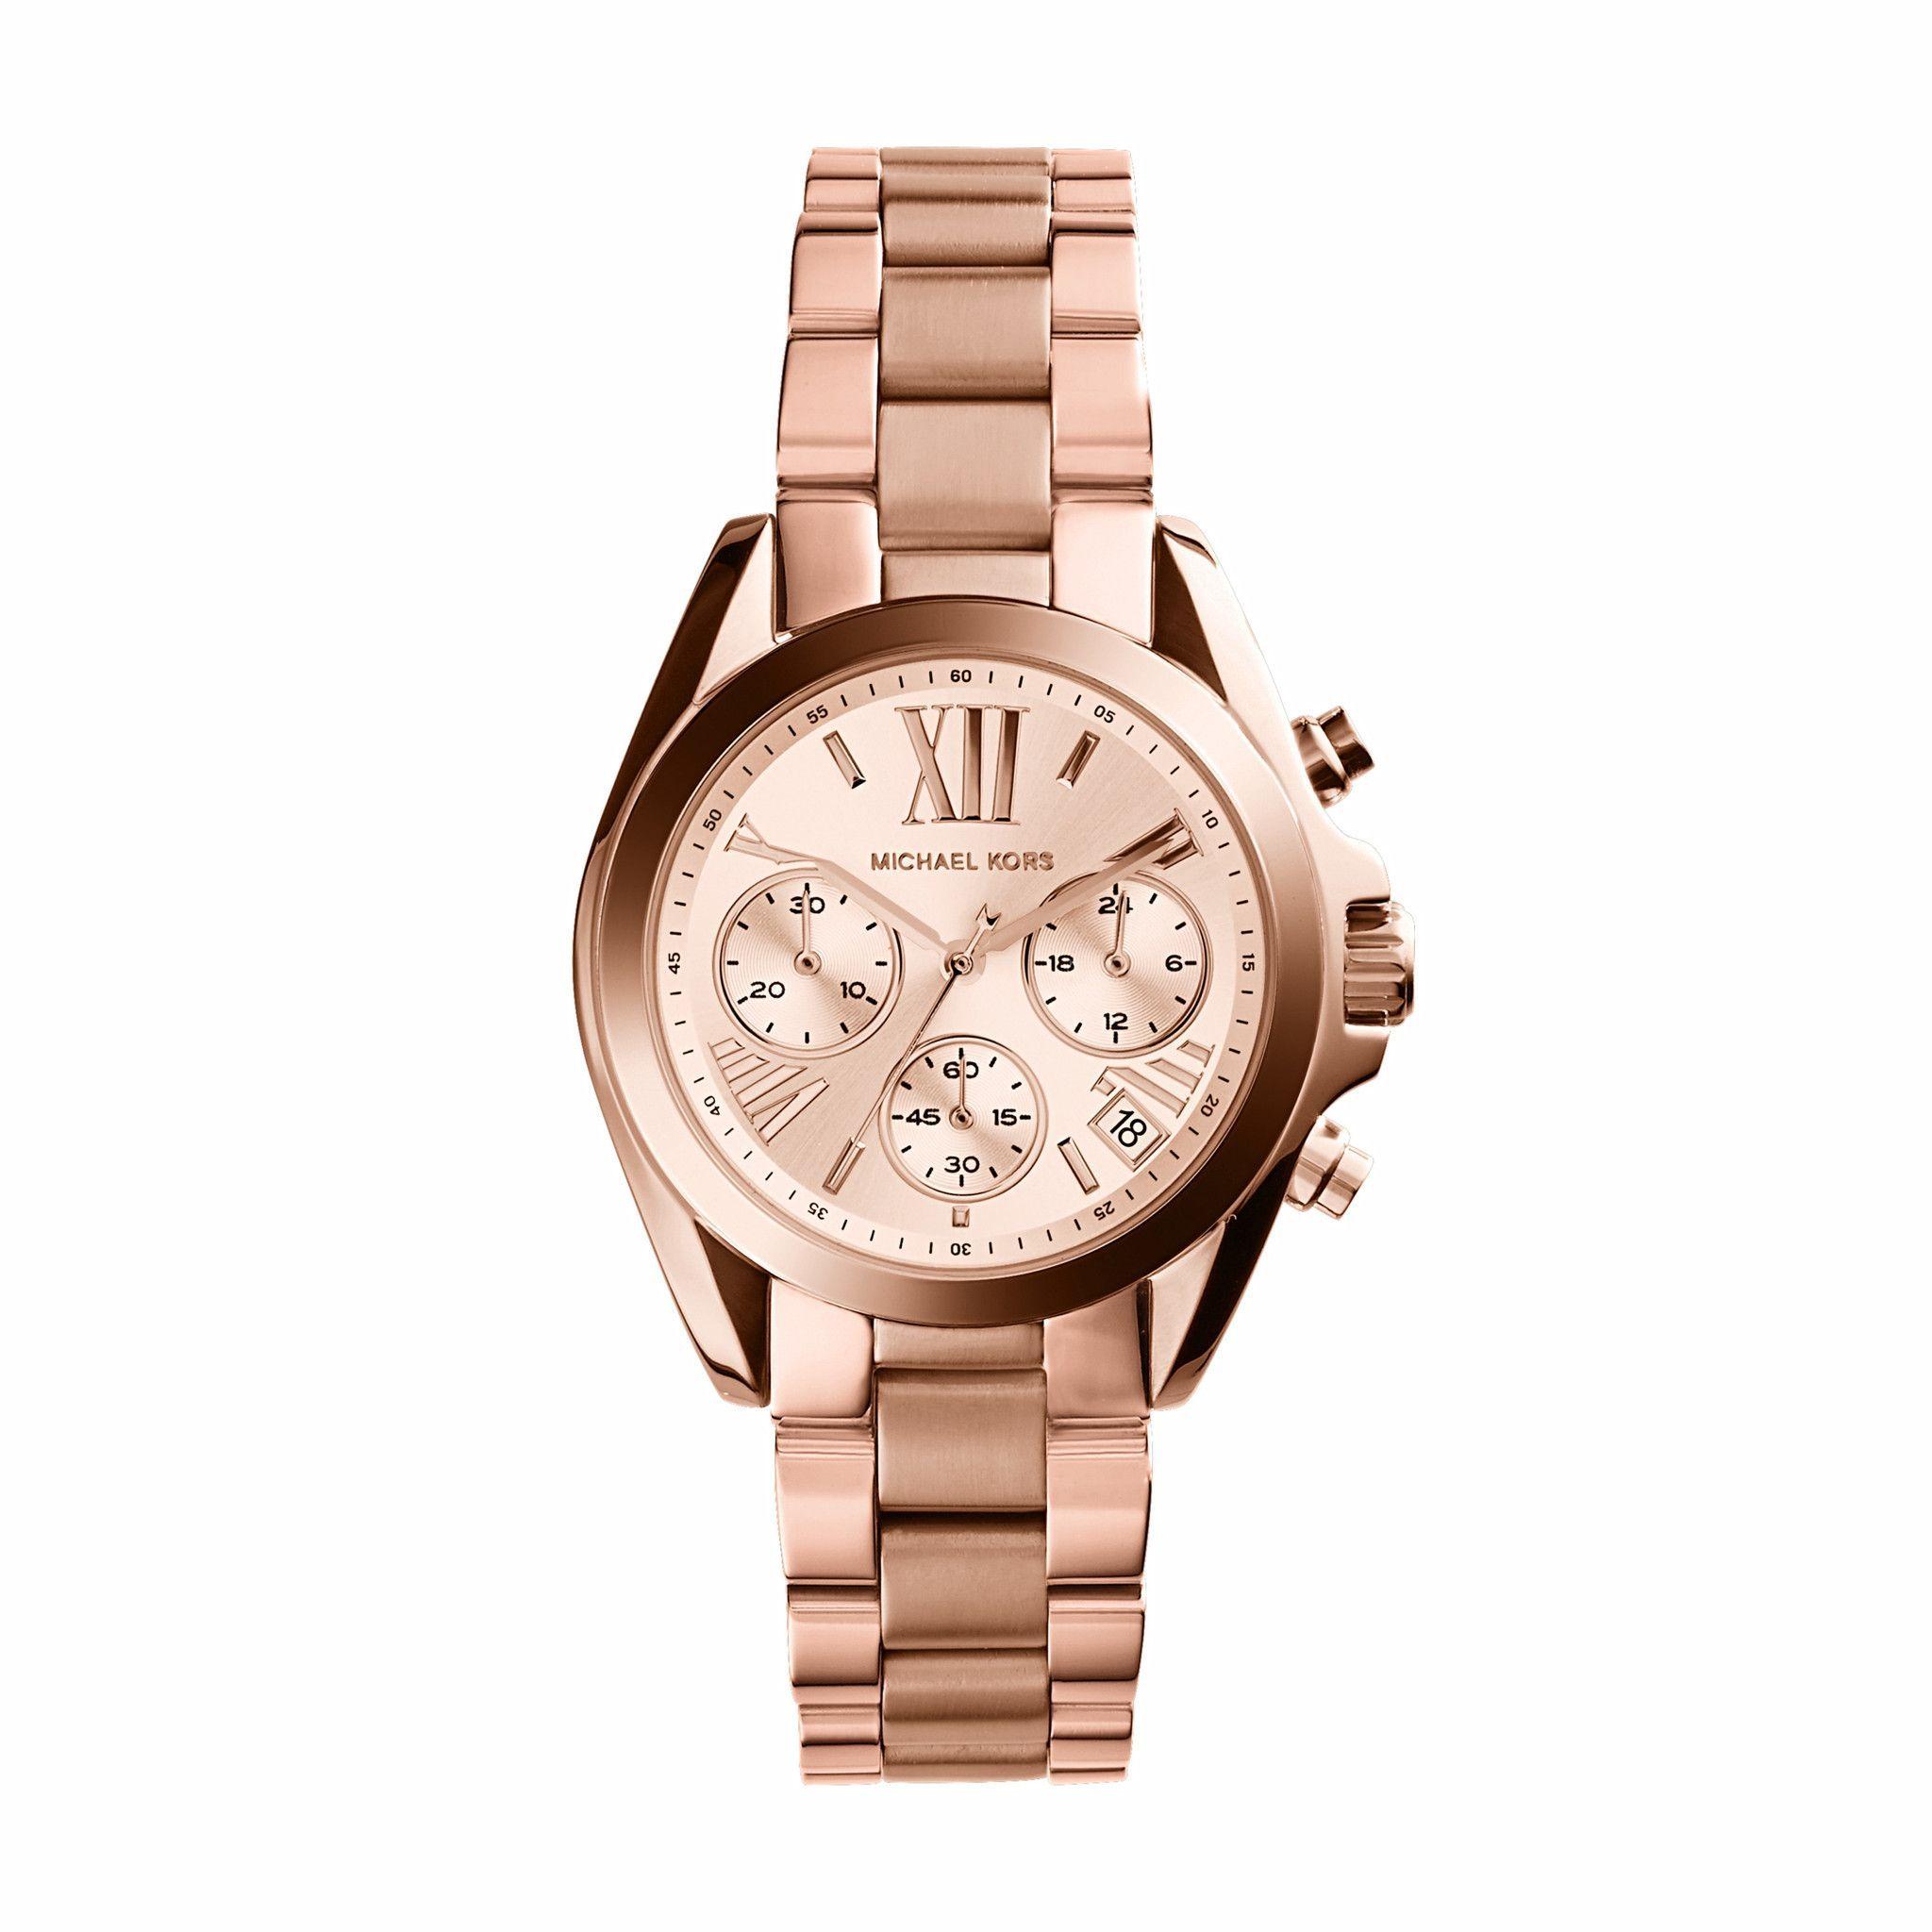 d96e660d26f59 Michael Kors Bradshaw Rose Gold-Tone Stainless Steel Ladies Chronograph  Watch